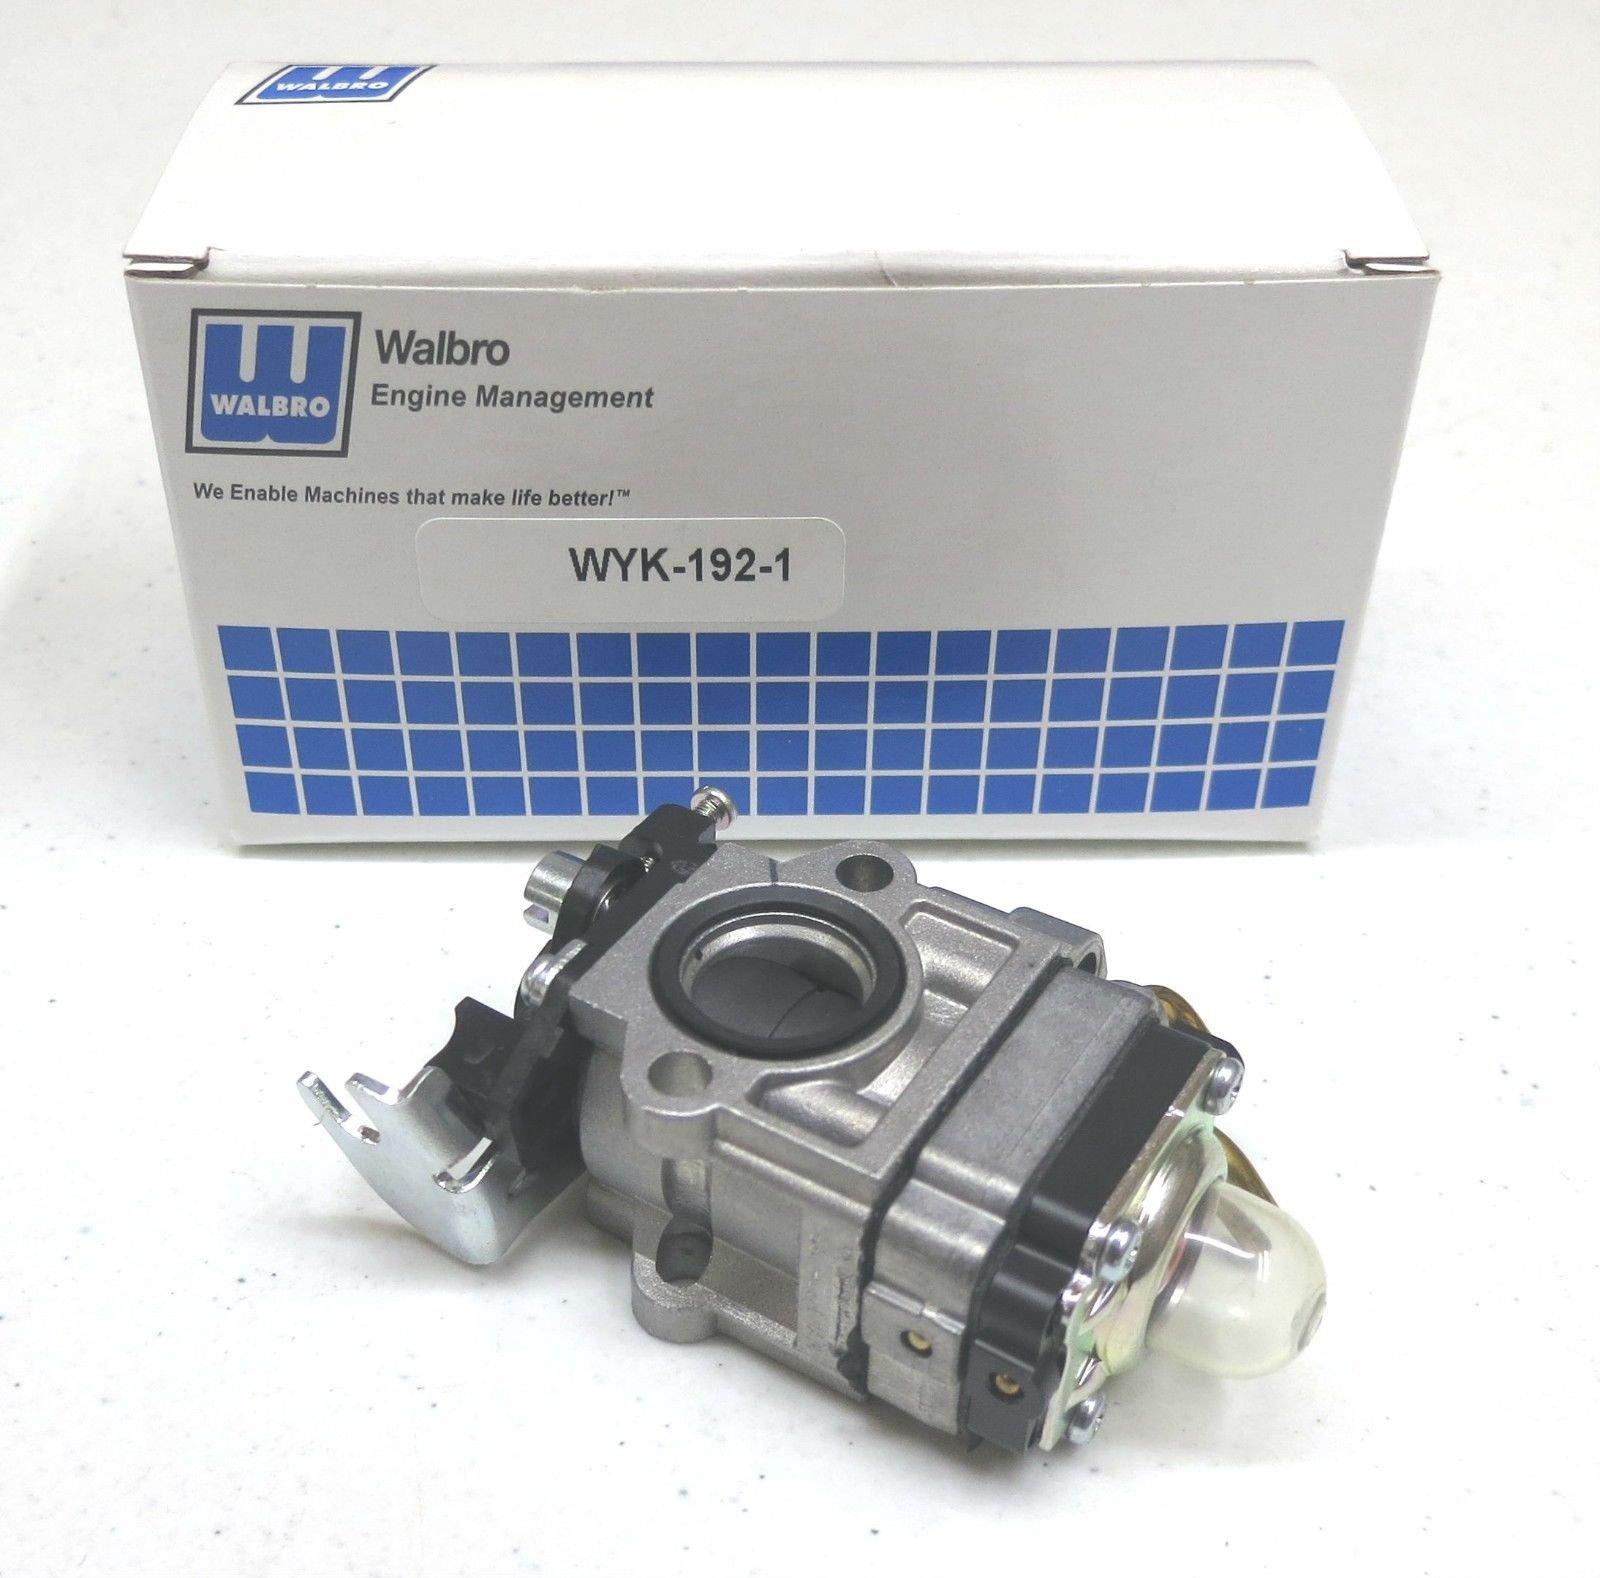 OEM Walbro WYK-192 CARBURETOR Carb EB633RT Shindaiwa Power Backpack Leaf Blower supplier_id_theropshop, #UGEIO40252085494954 by Anihoslen